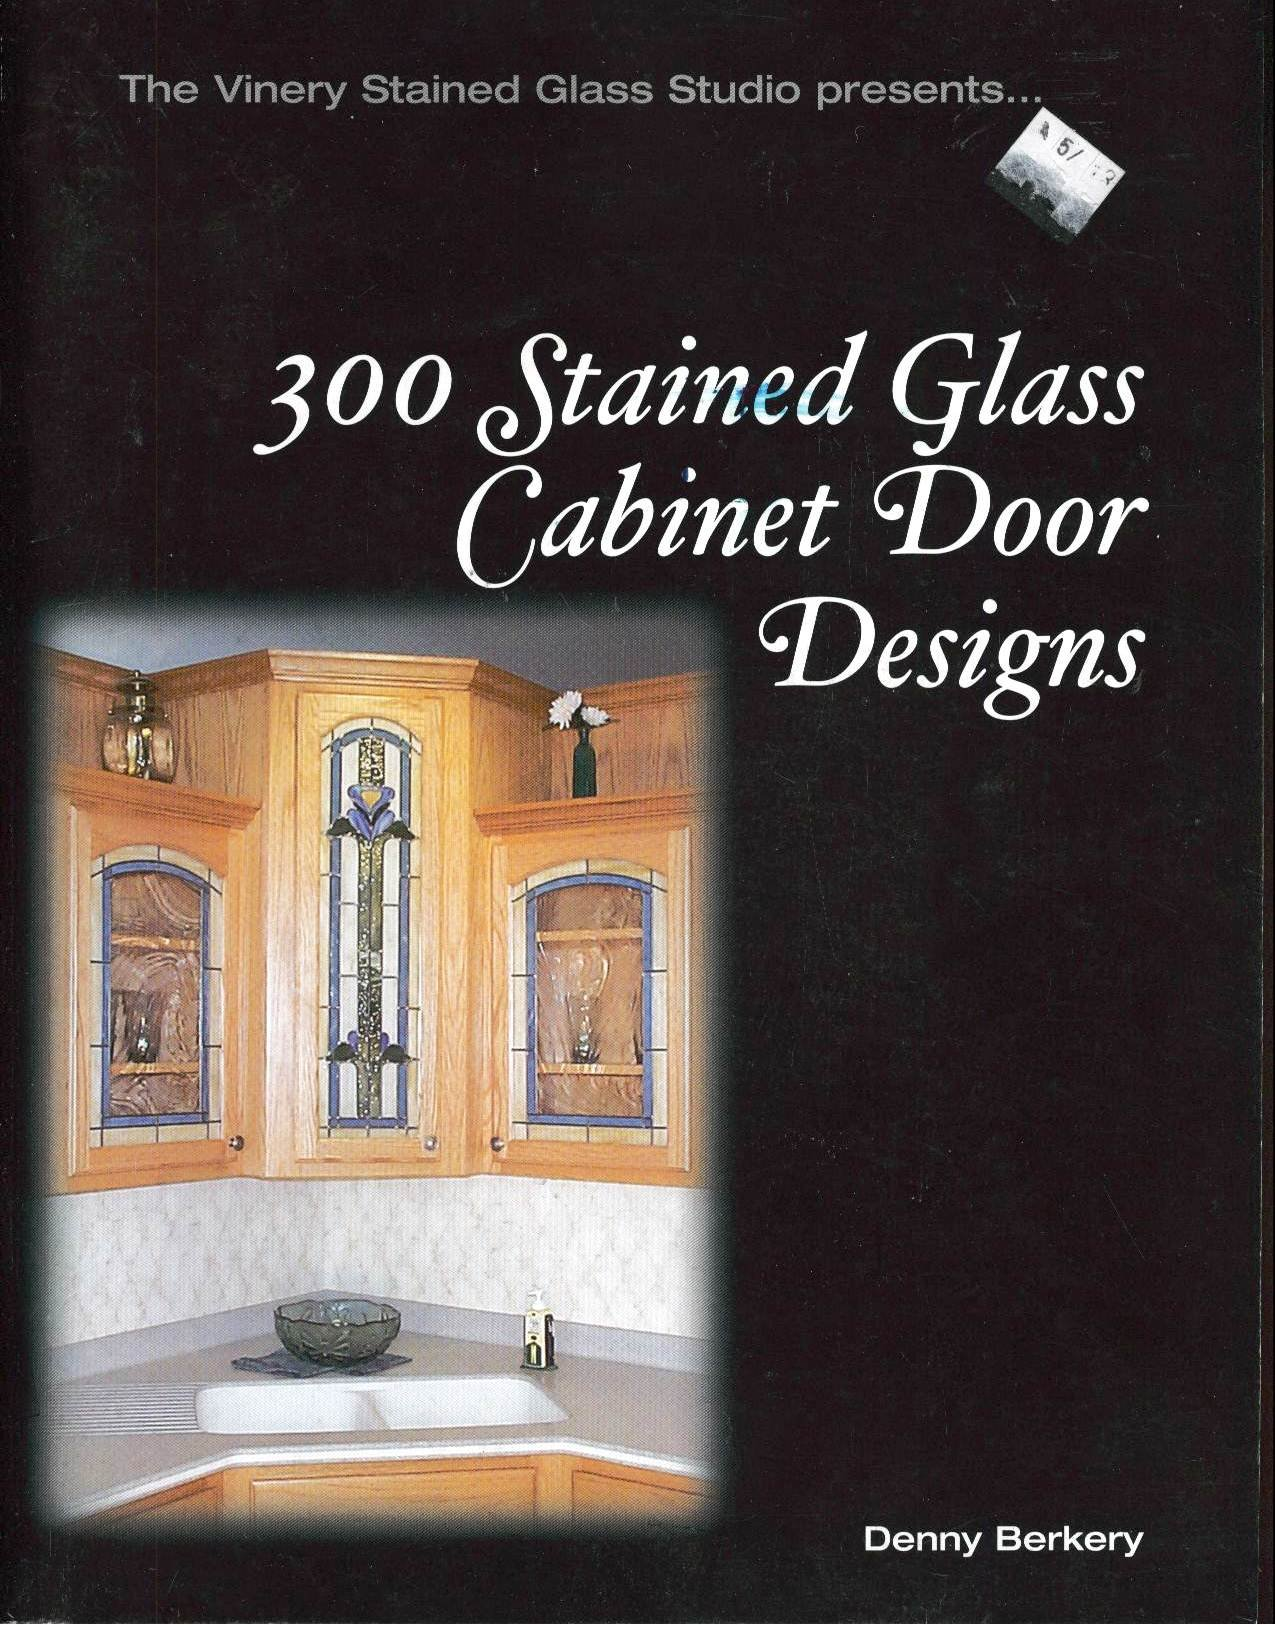 300 Stained Glass Cabinet Door Designs Denny Berkery 9780971807808